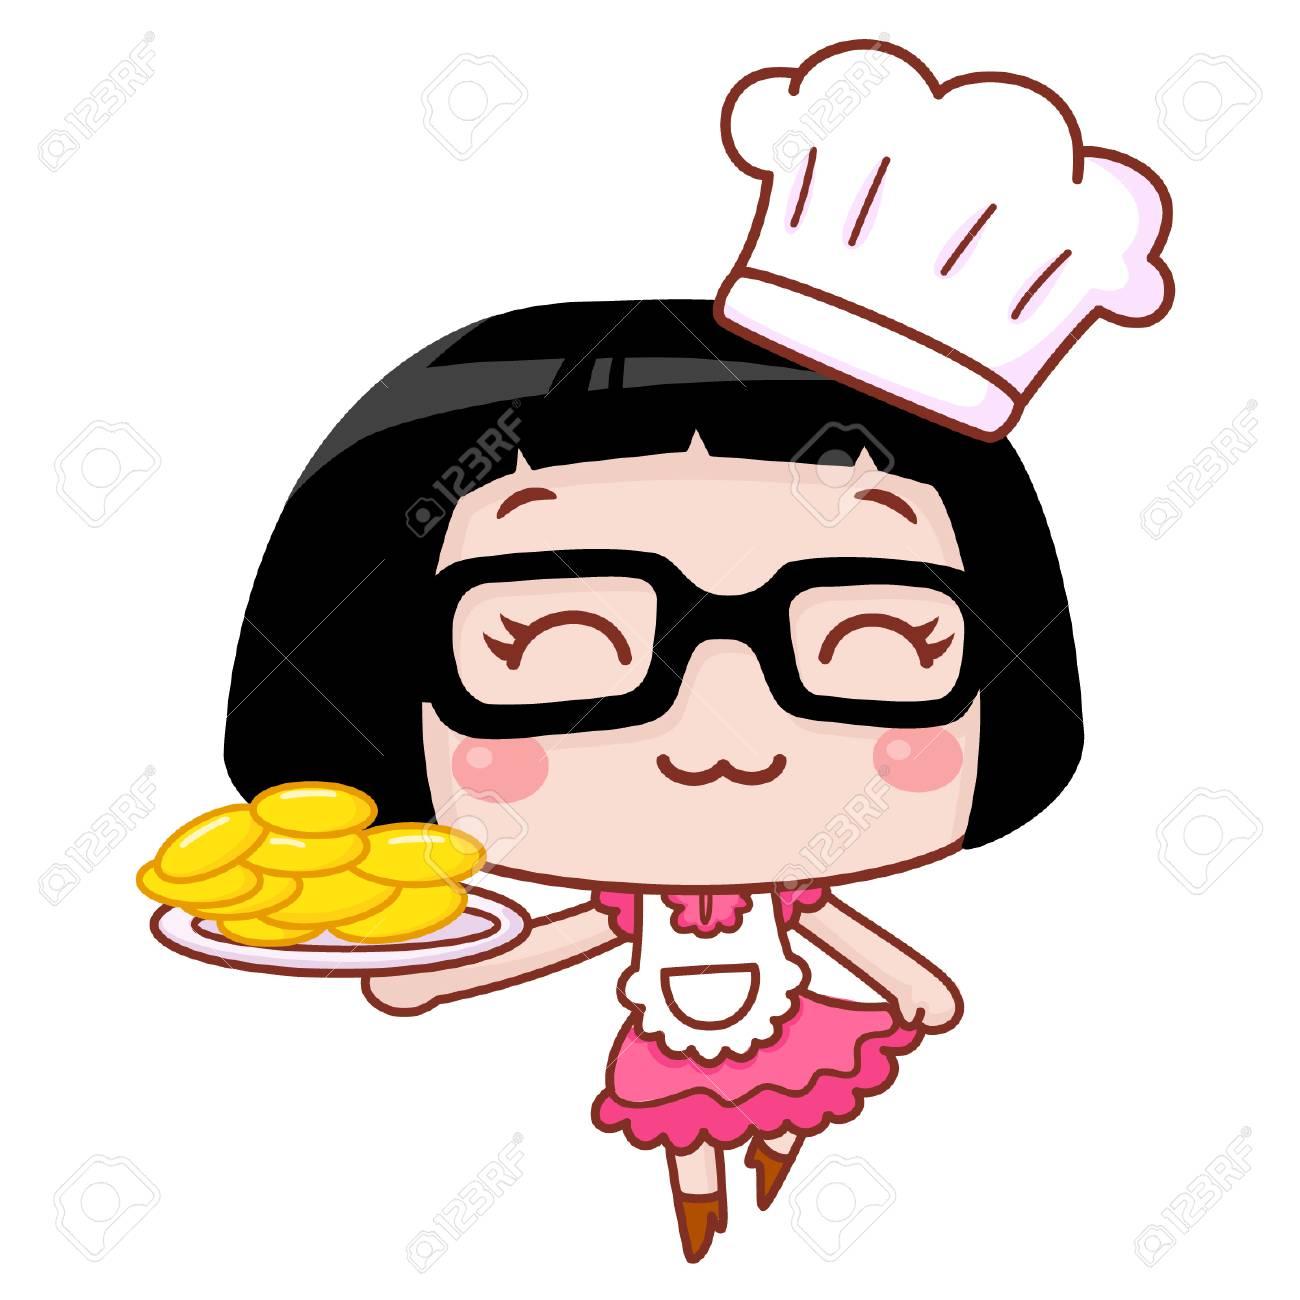 Cute cartoon chef girl holding a dish.